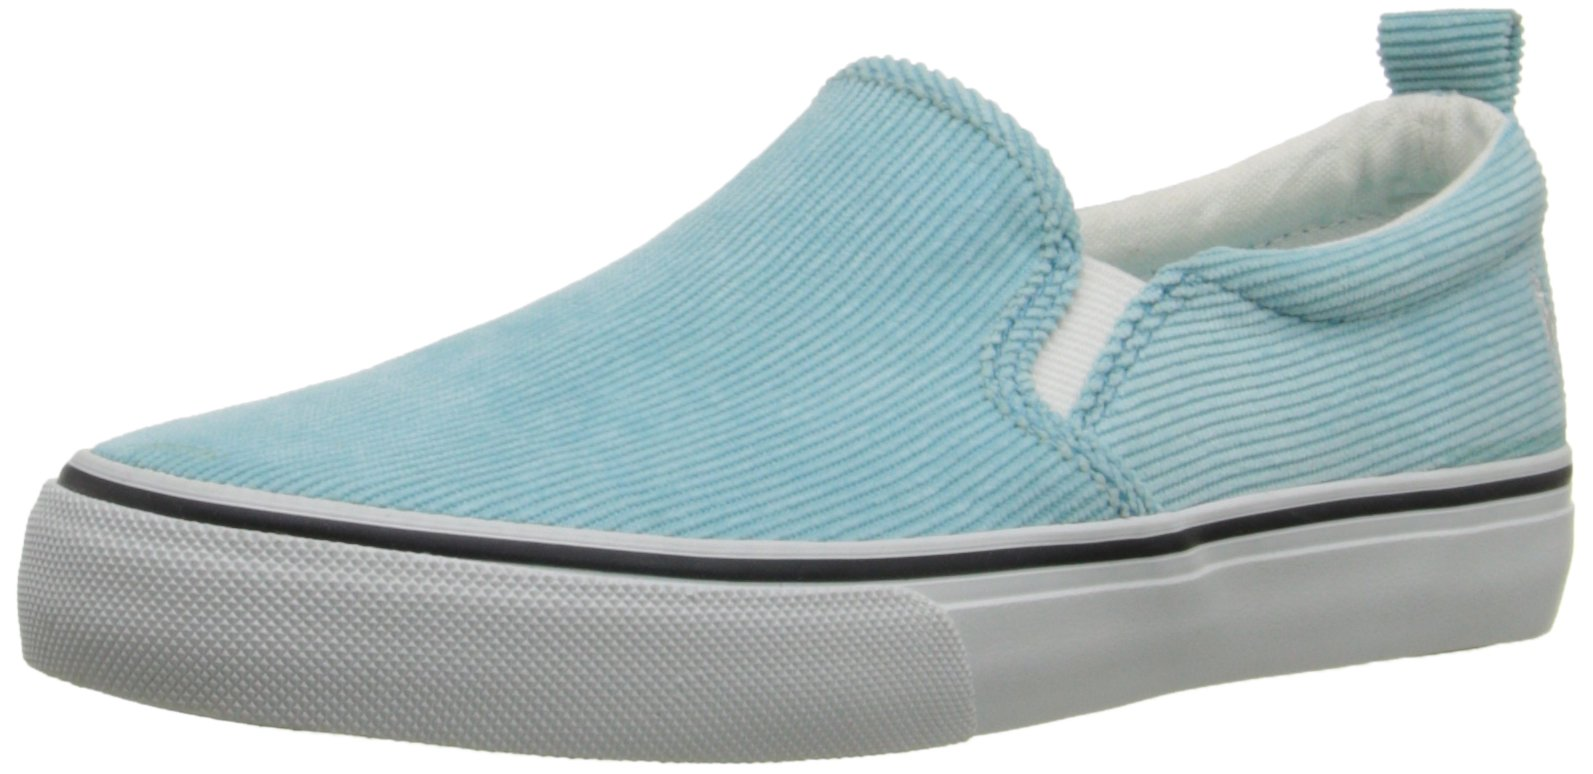 Polo Ralph Lauren Kids Carleetwingore CR Dry Fashion Sneaker (Little Kid/Big Kid), Turquoise, 1 M US Little Kid